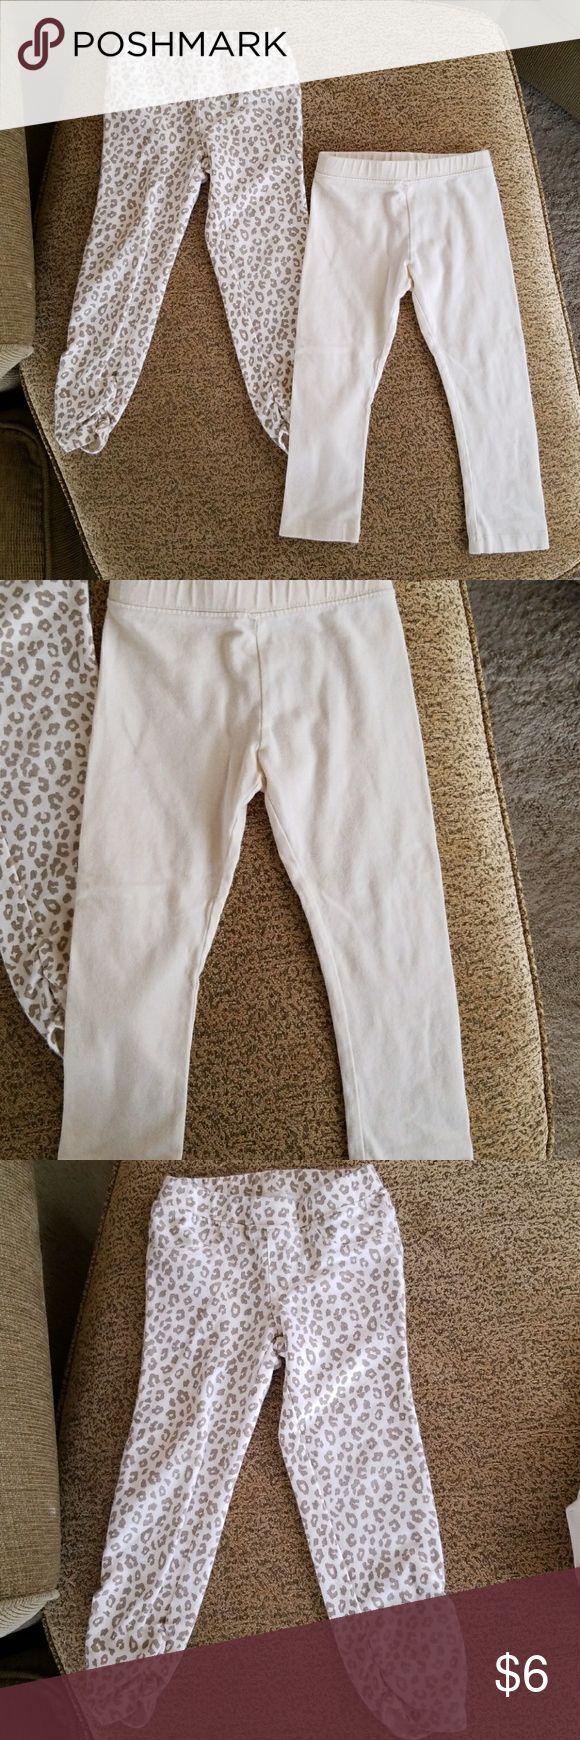 Legging bundle. Leopard print and cream leggings.  GUC. Various brands. Cream leggings have a light gold sparkle in them. Bottoms Leggings